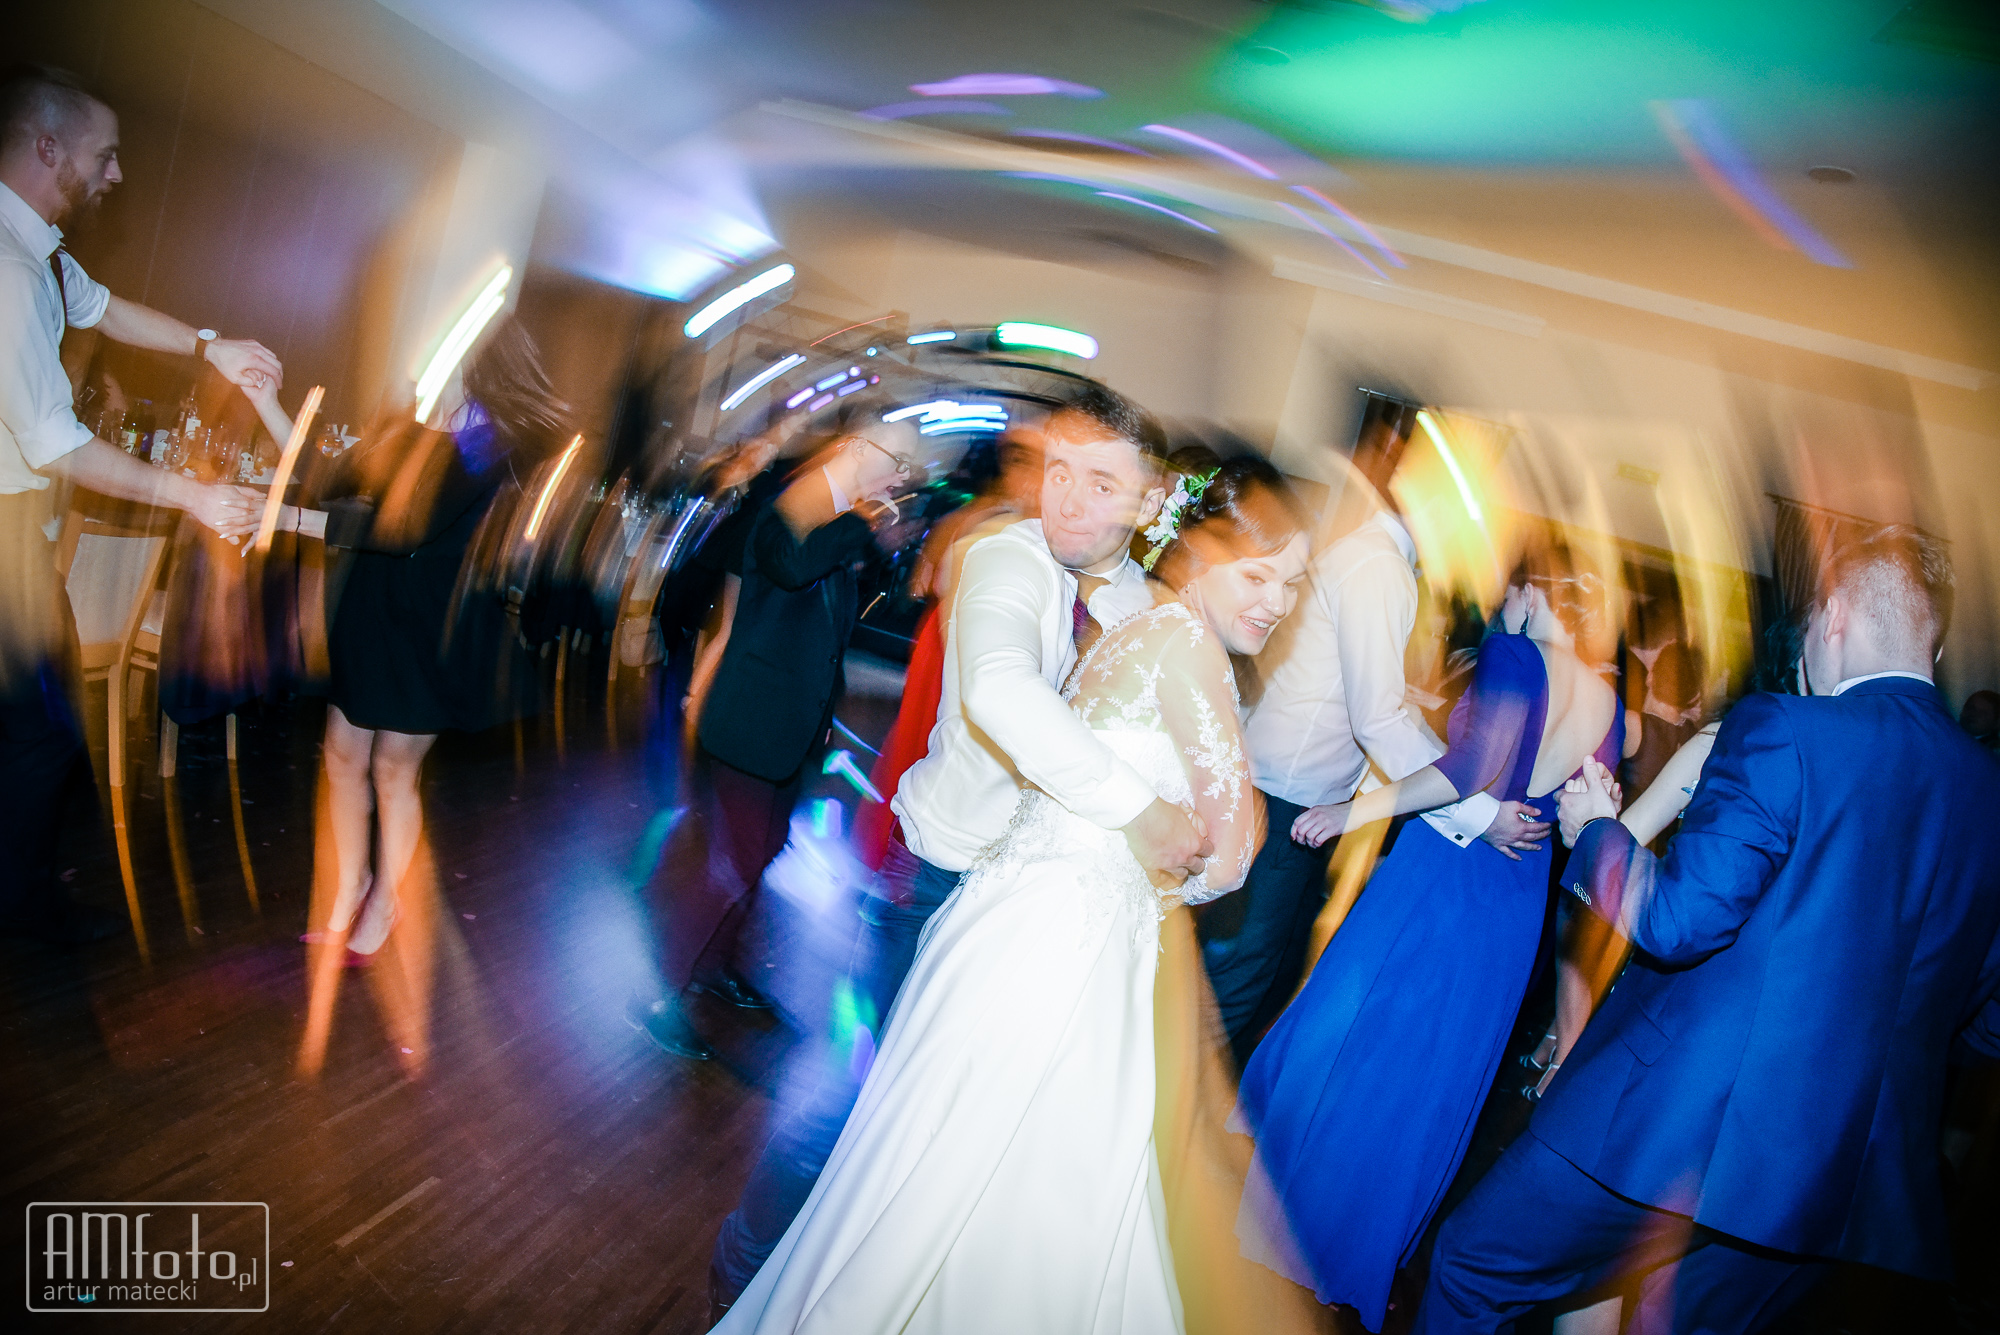 Anna&Karol_a_wesele__www_amfoto_pl-1849.jpg